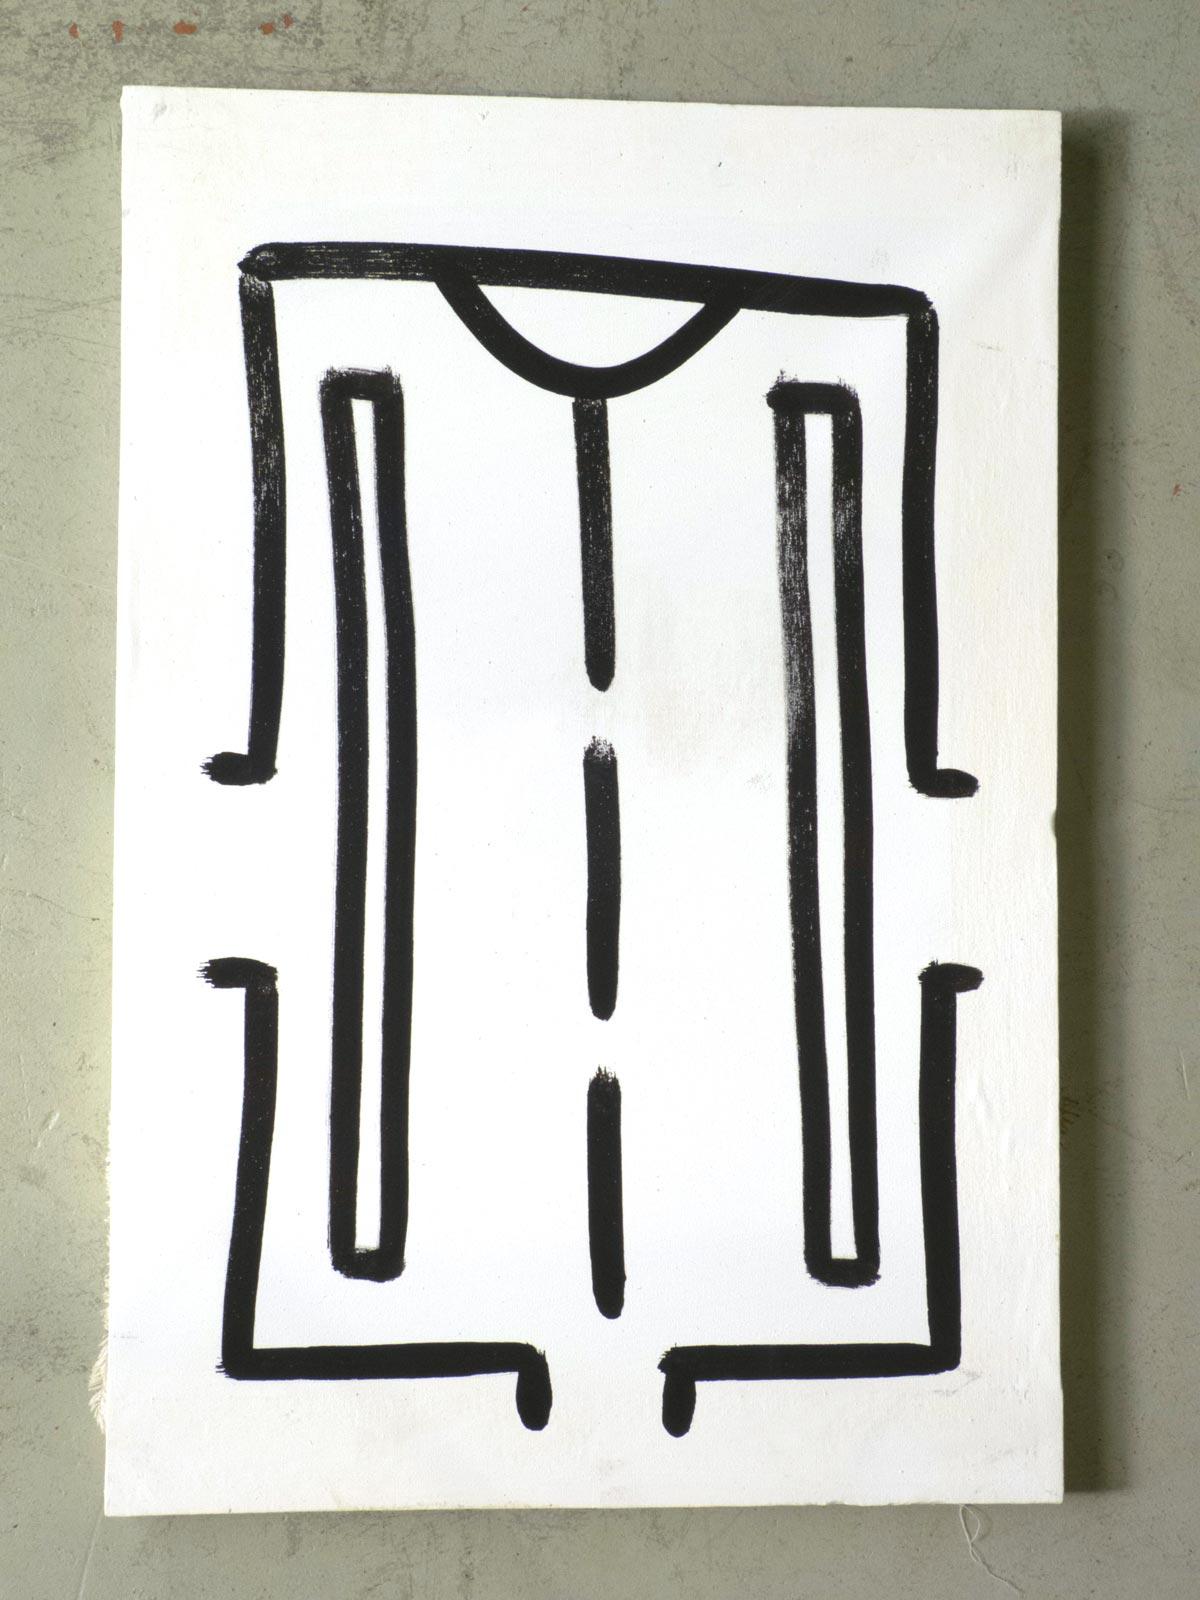 Urban-Manegold-There-is-no-Private-Privatleben-Privatsphäre-Rauminstallation-Experiment-Typographie-Portrait-Gesellschaft-Licht-Kunst-Transparent-LED-Madlight-portrait_multiplex_3